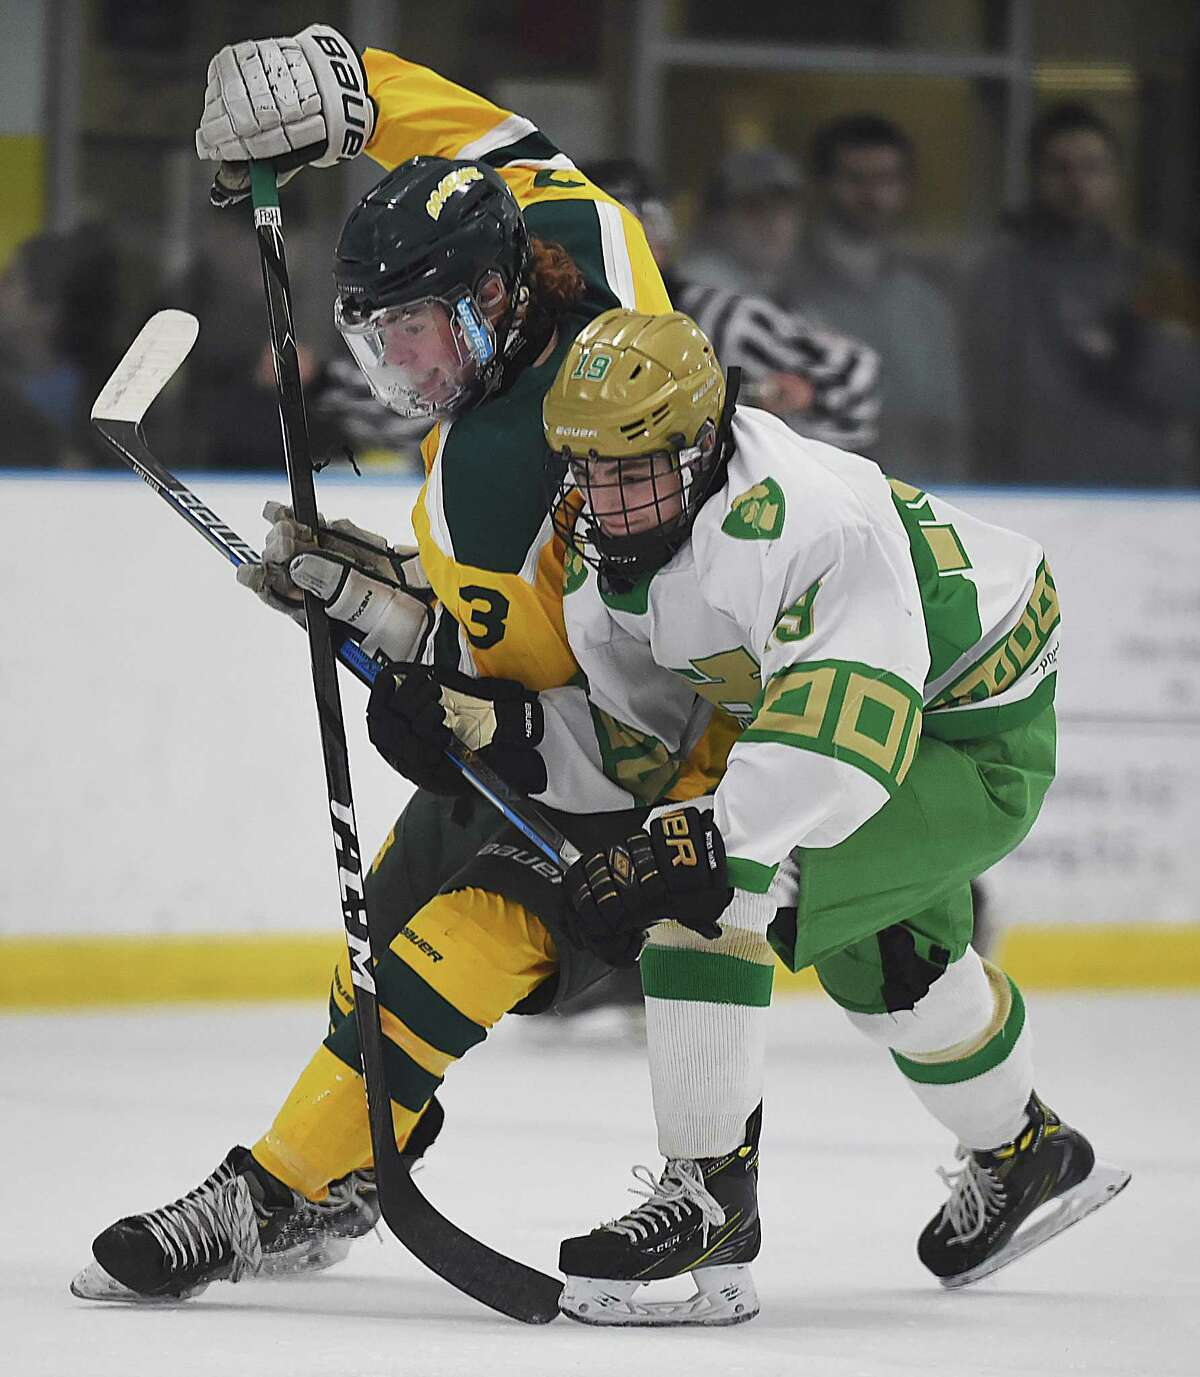 Notre Dame-West Haven defenseman Connor Morgan, right, battles Hamden forward Zach Owens for a loose puck Saturday at Astorino Rink in Hamden.